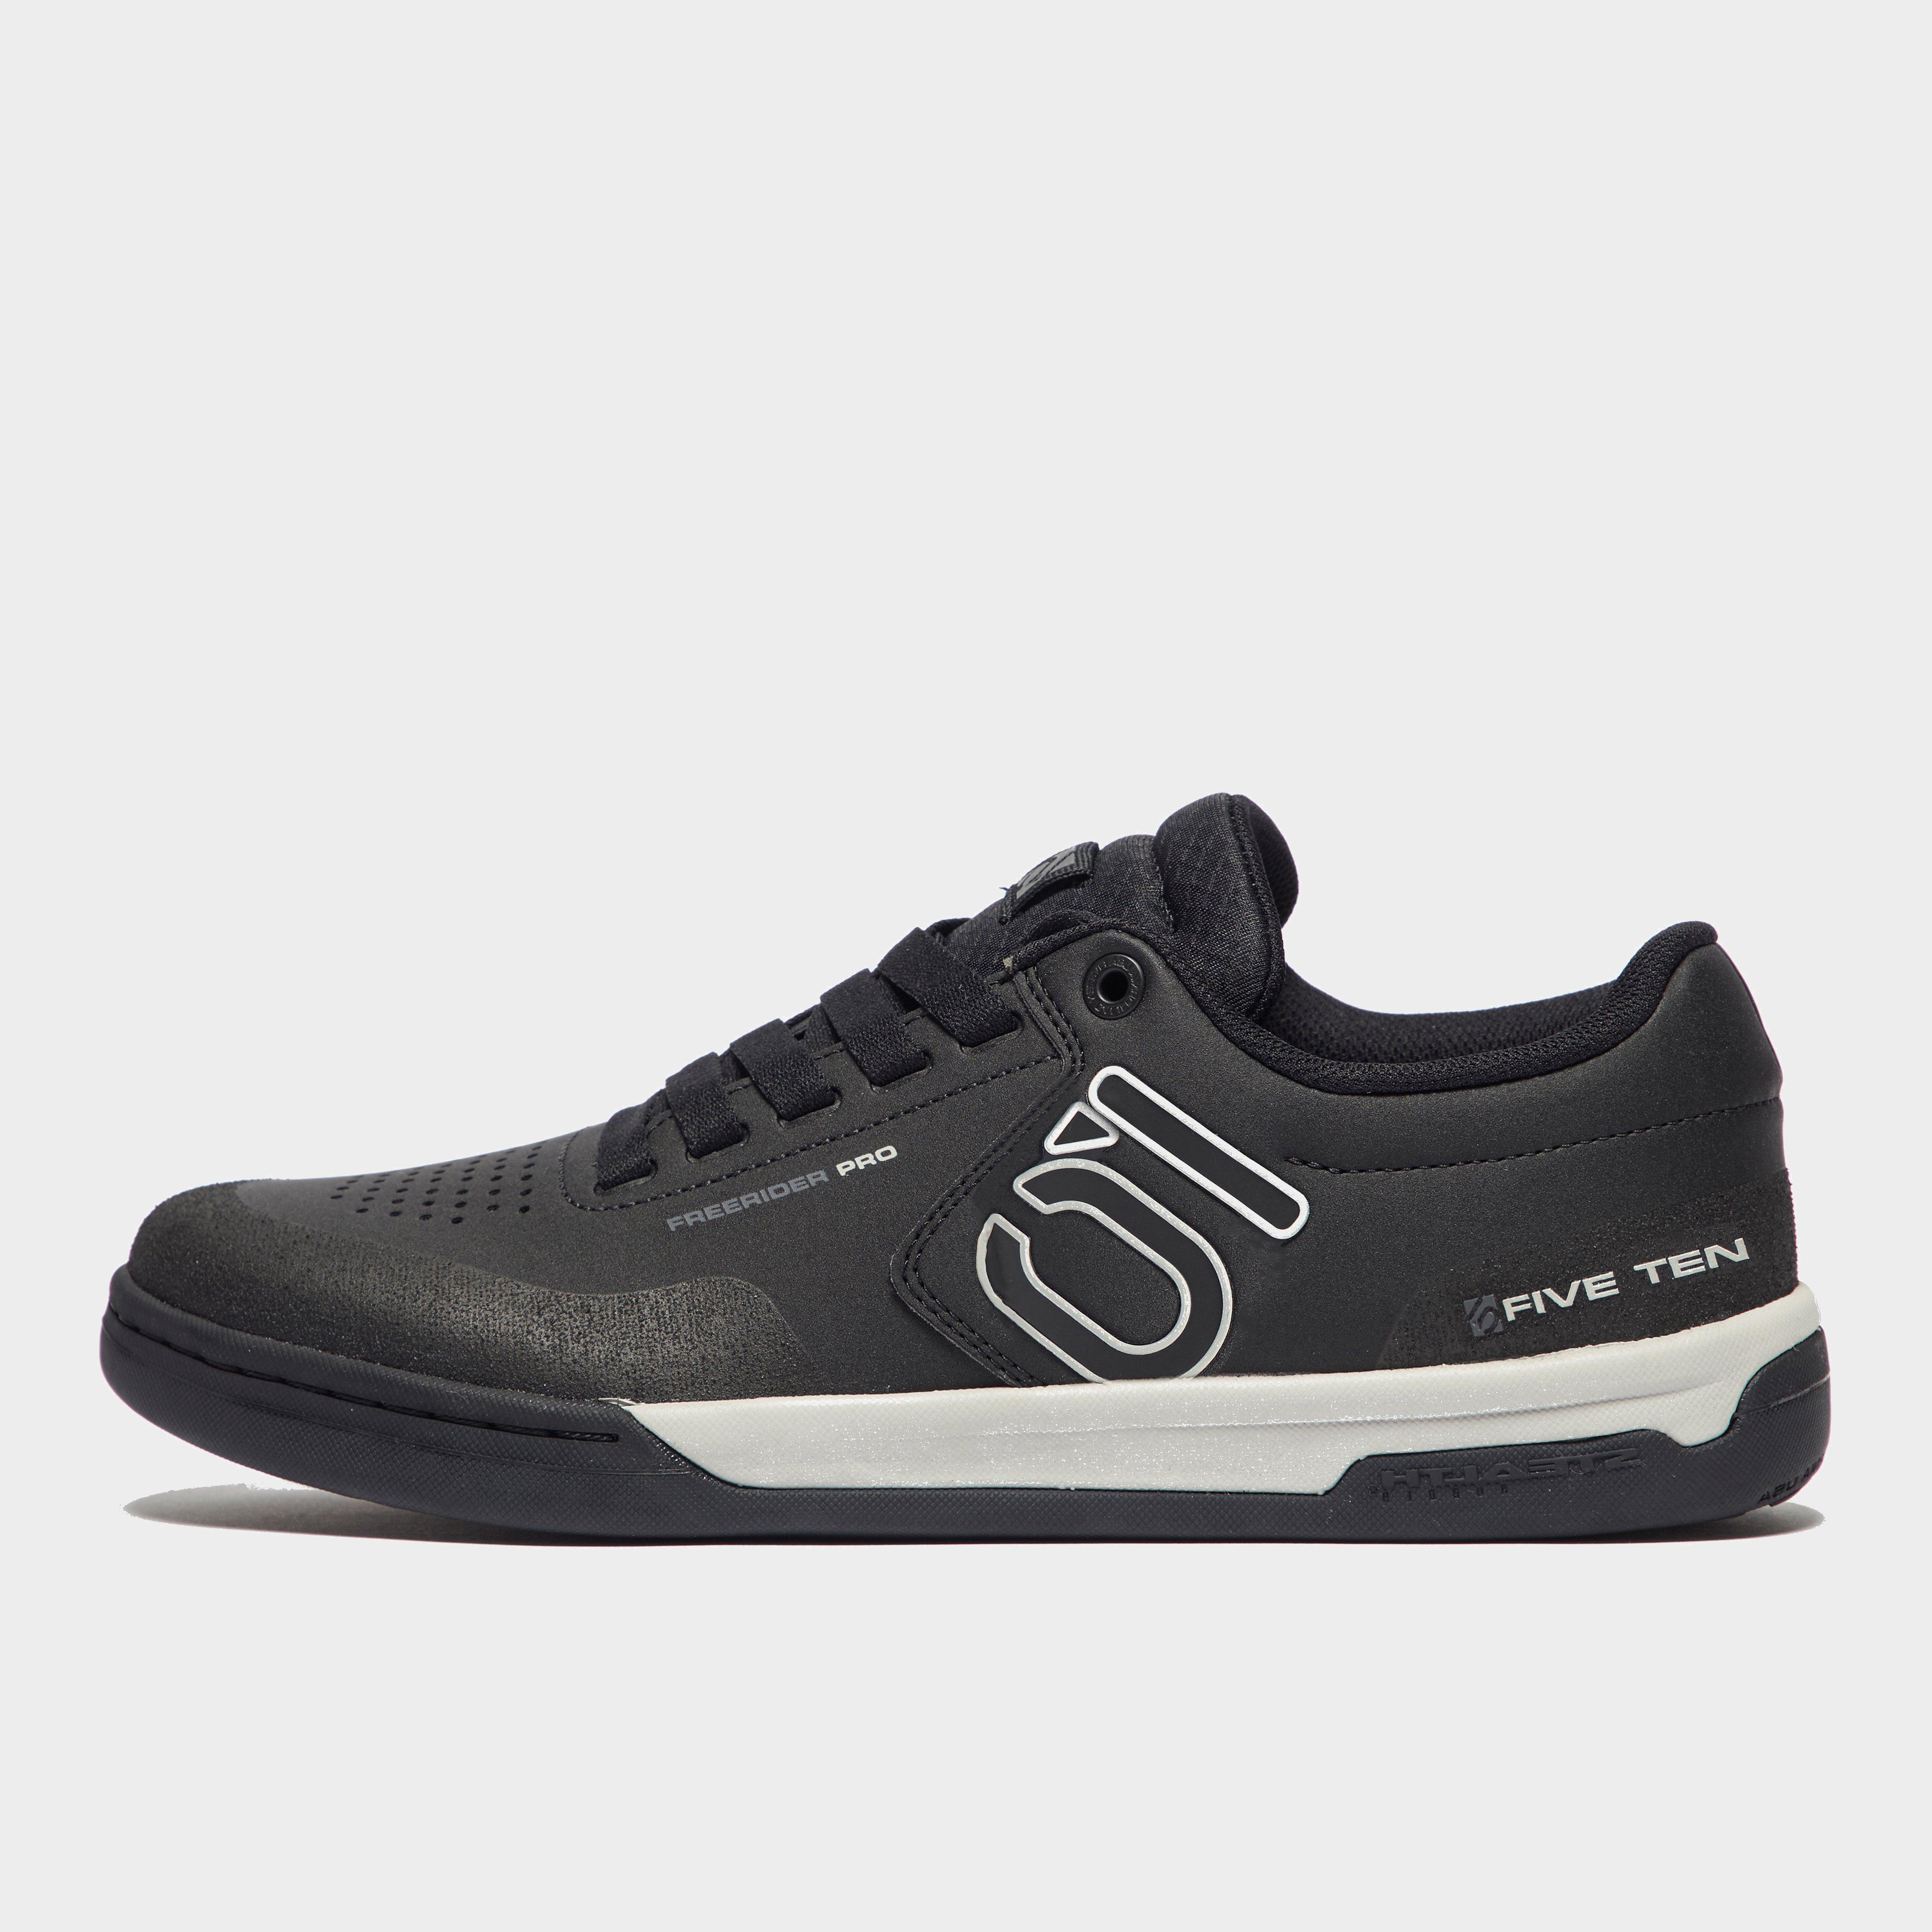 Adidas Five Ten Adidas Five Ten Unisex Freerider Pro Shoes - Black, Black